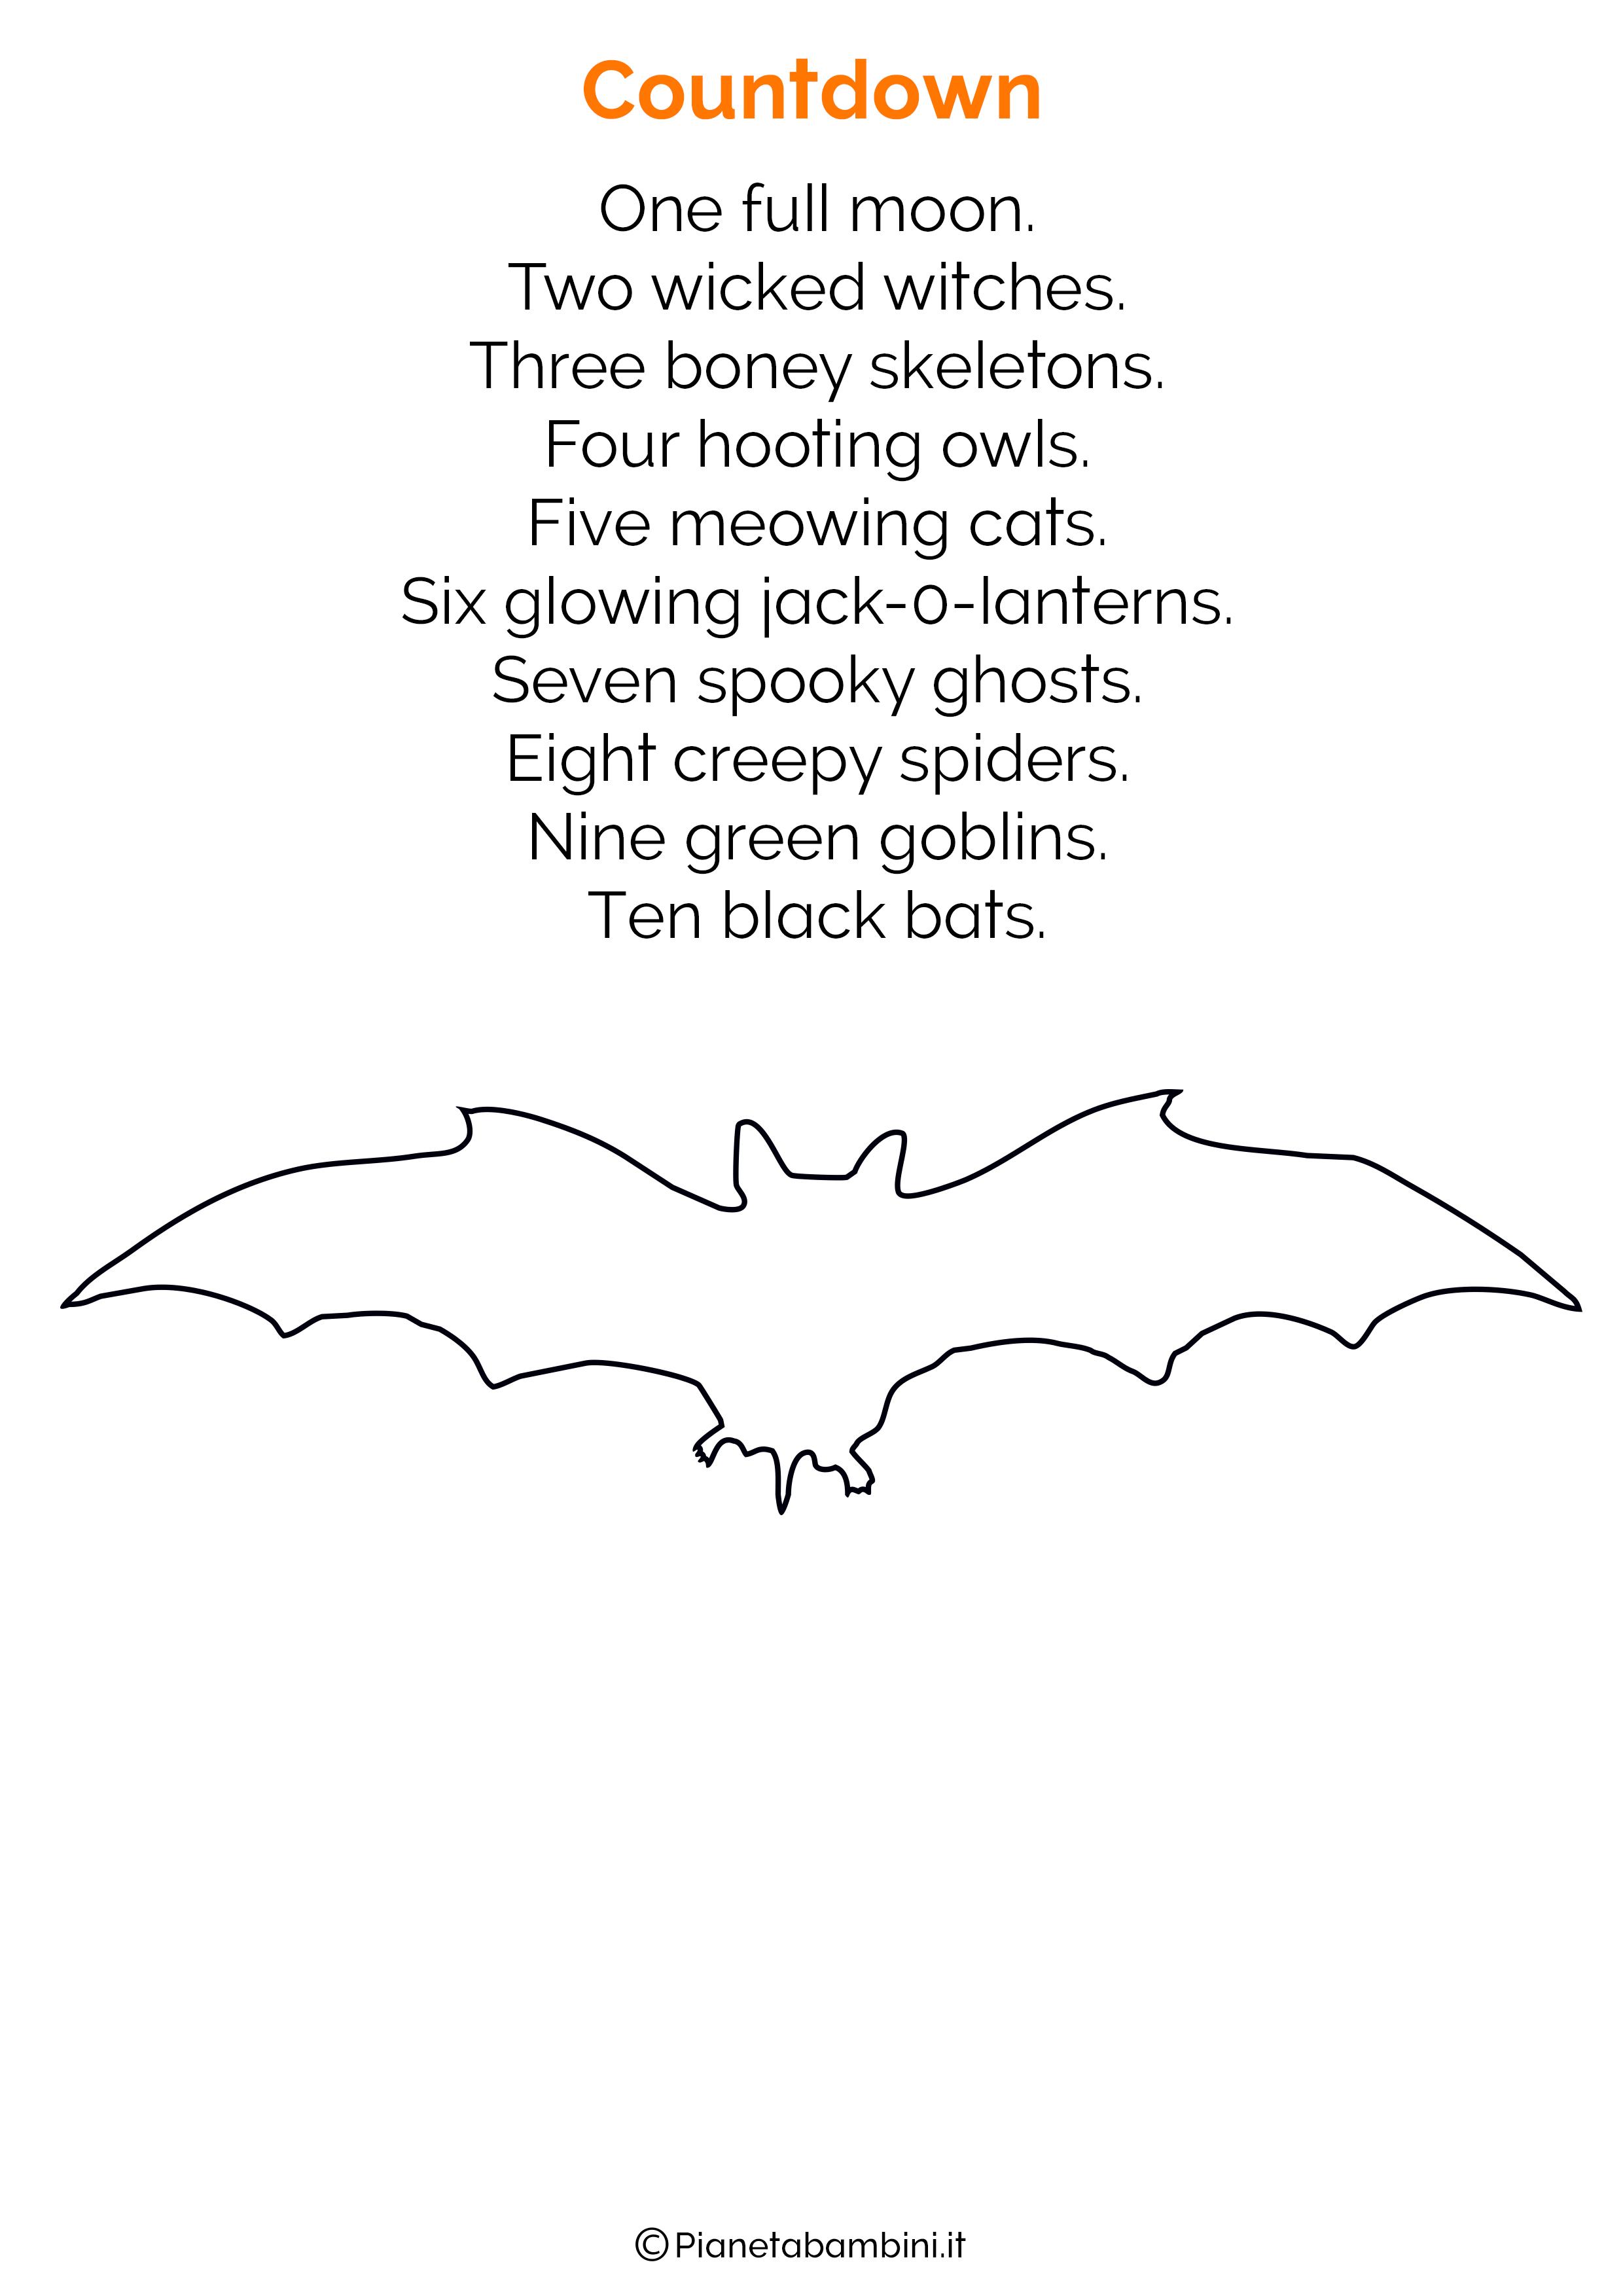 Filastrocca di Halloween in Inglese per bambini 08